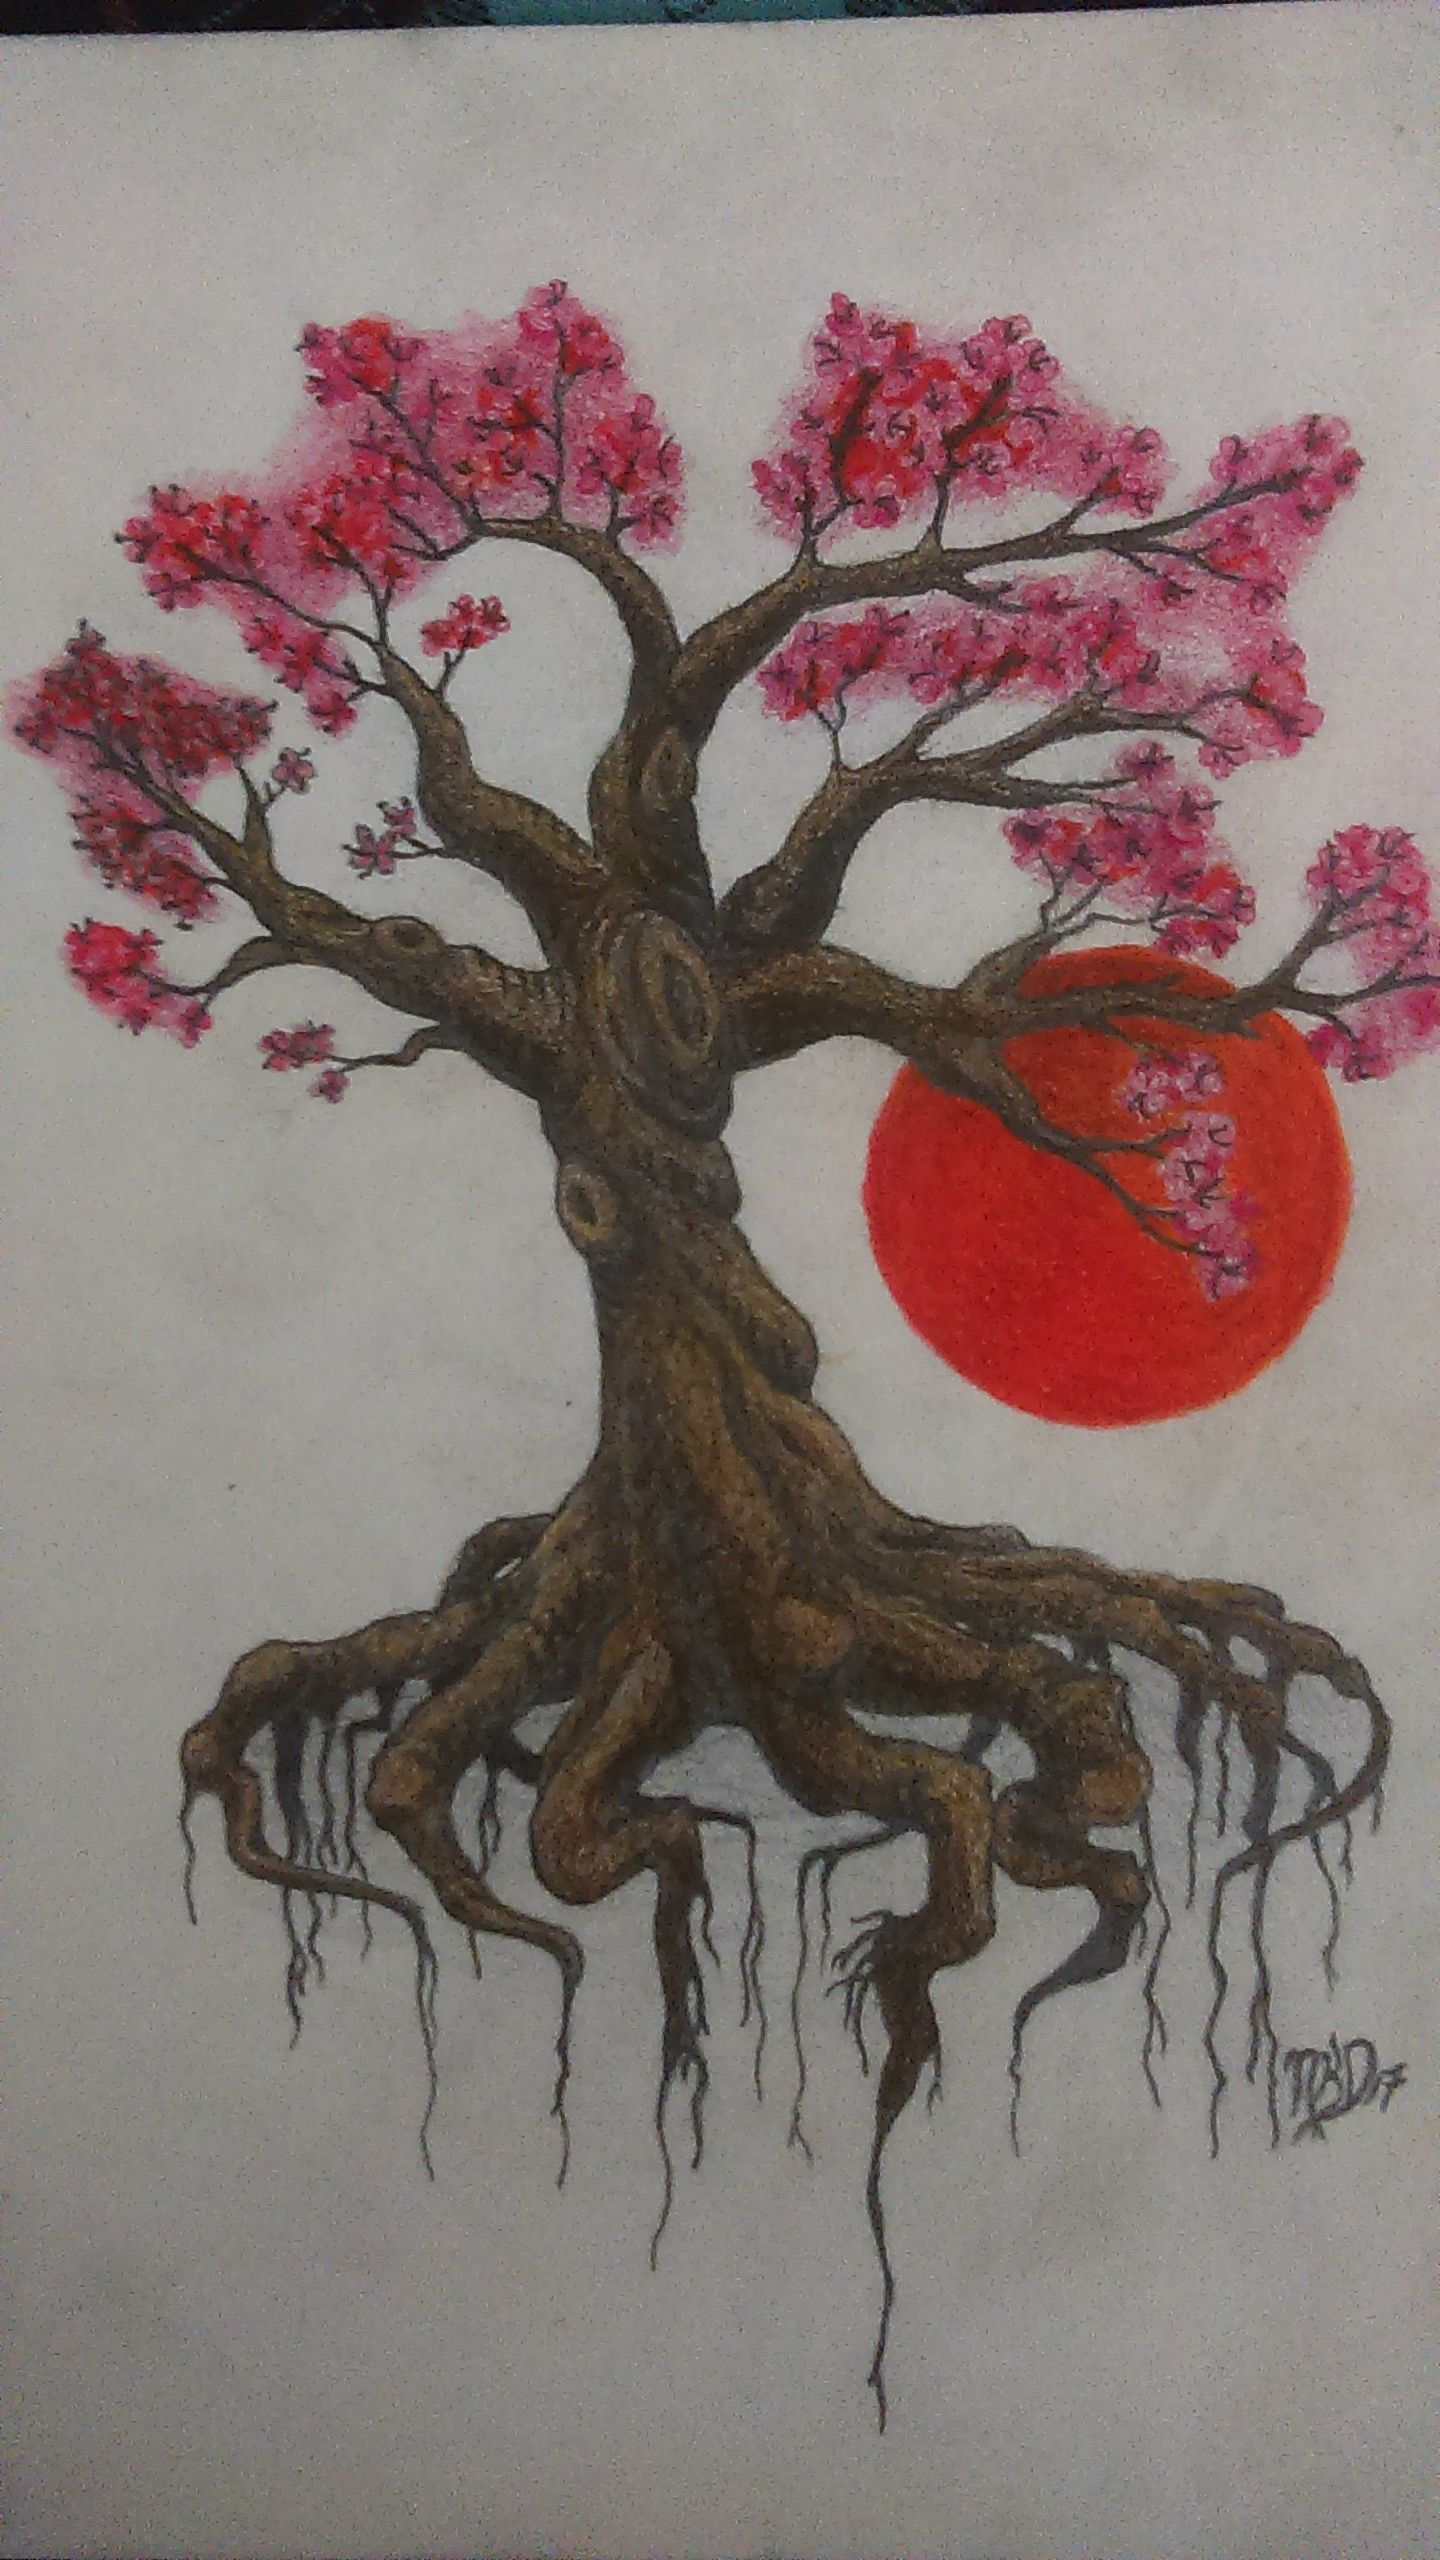 Cherry Blossom Tree Colored Pencil 8x11 Tree Sketches Cherry Tree Tattoos Cherry Blossom Tree Tattoo